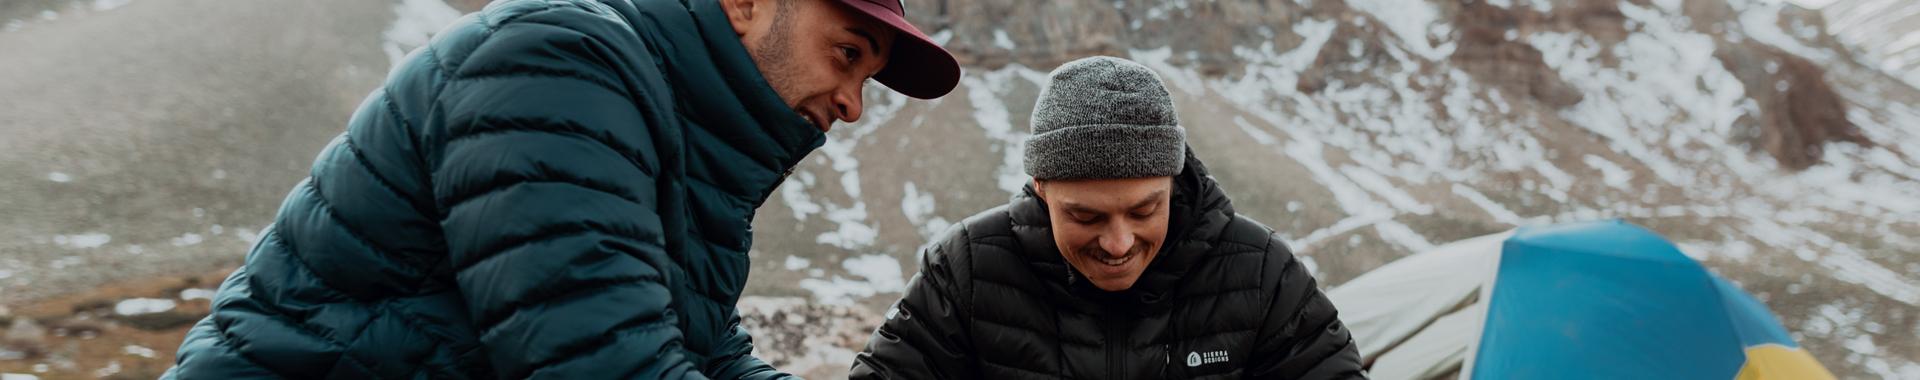 Two men winter camping